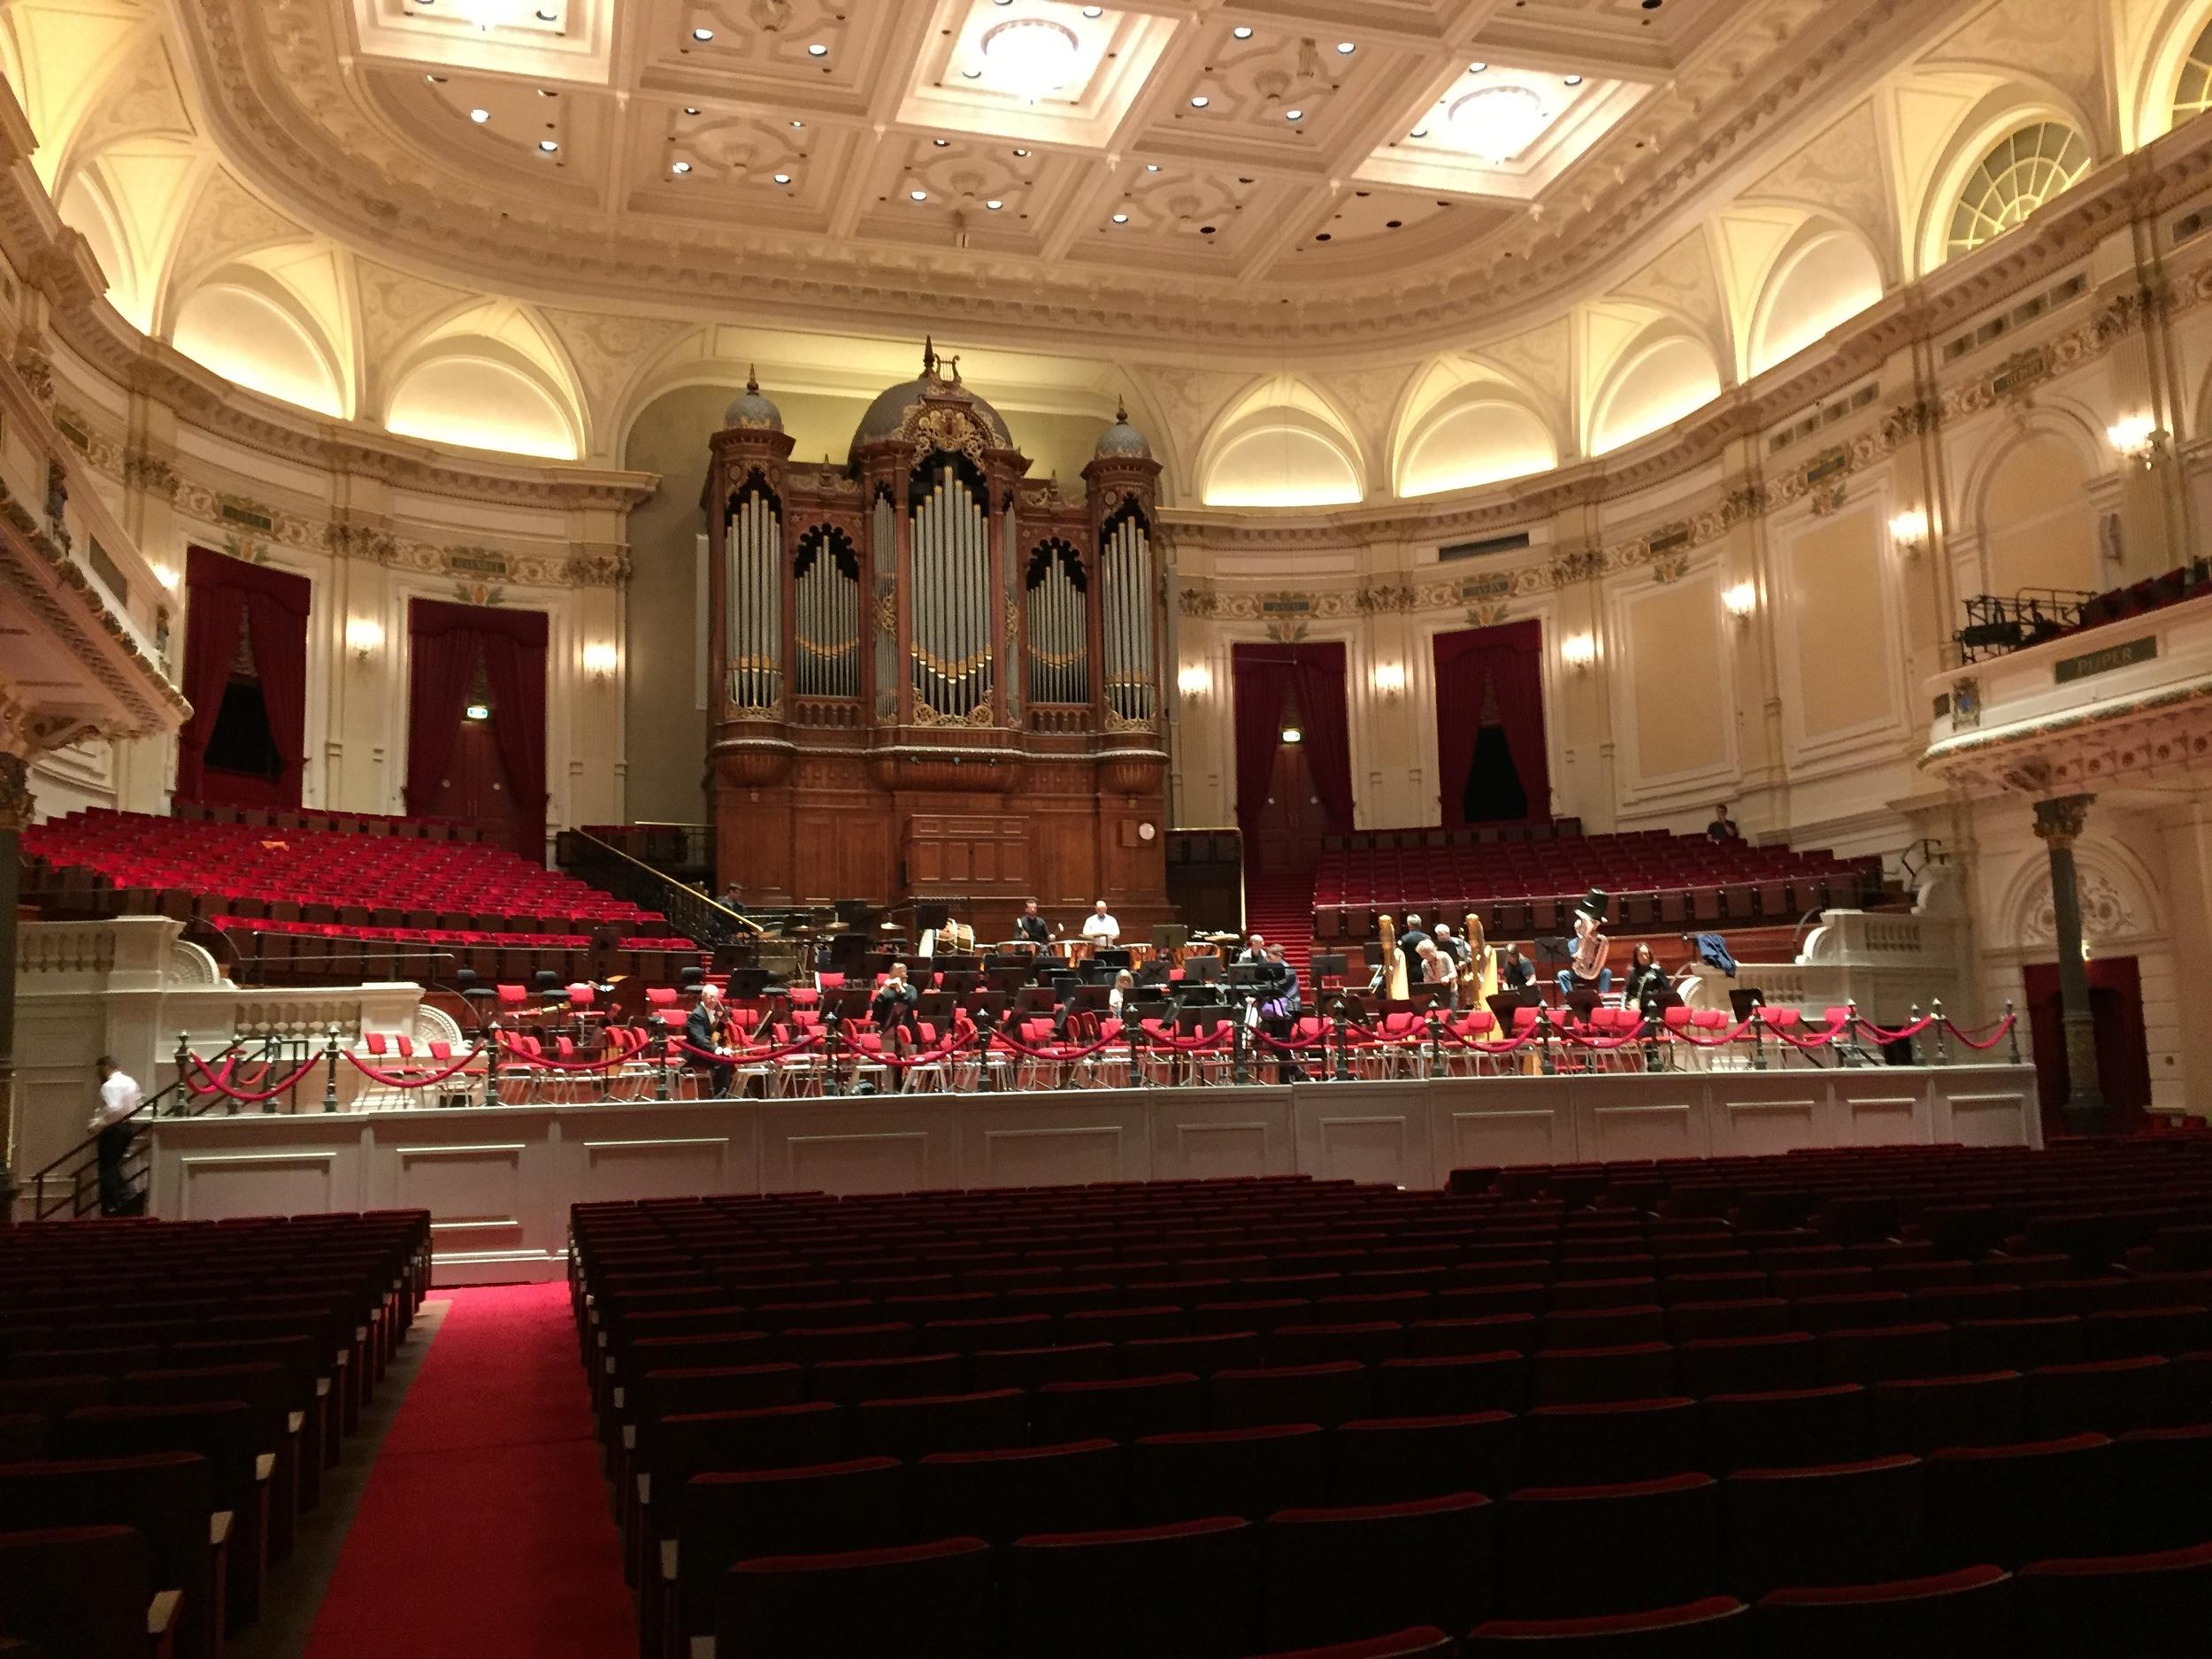 The Concertgebouw, Amsterdam